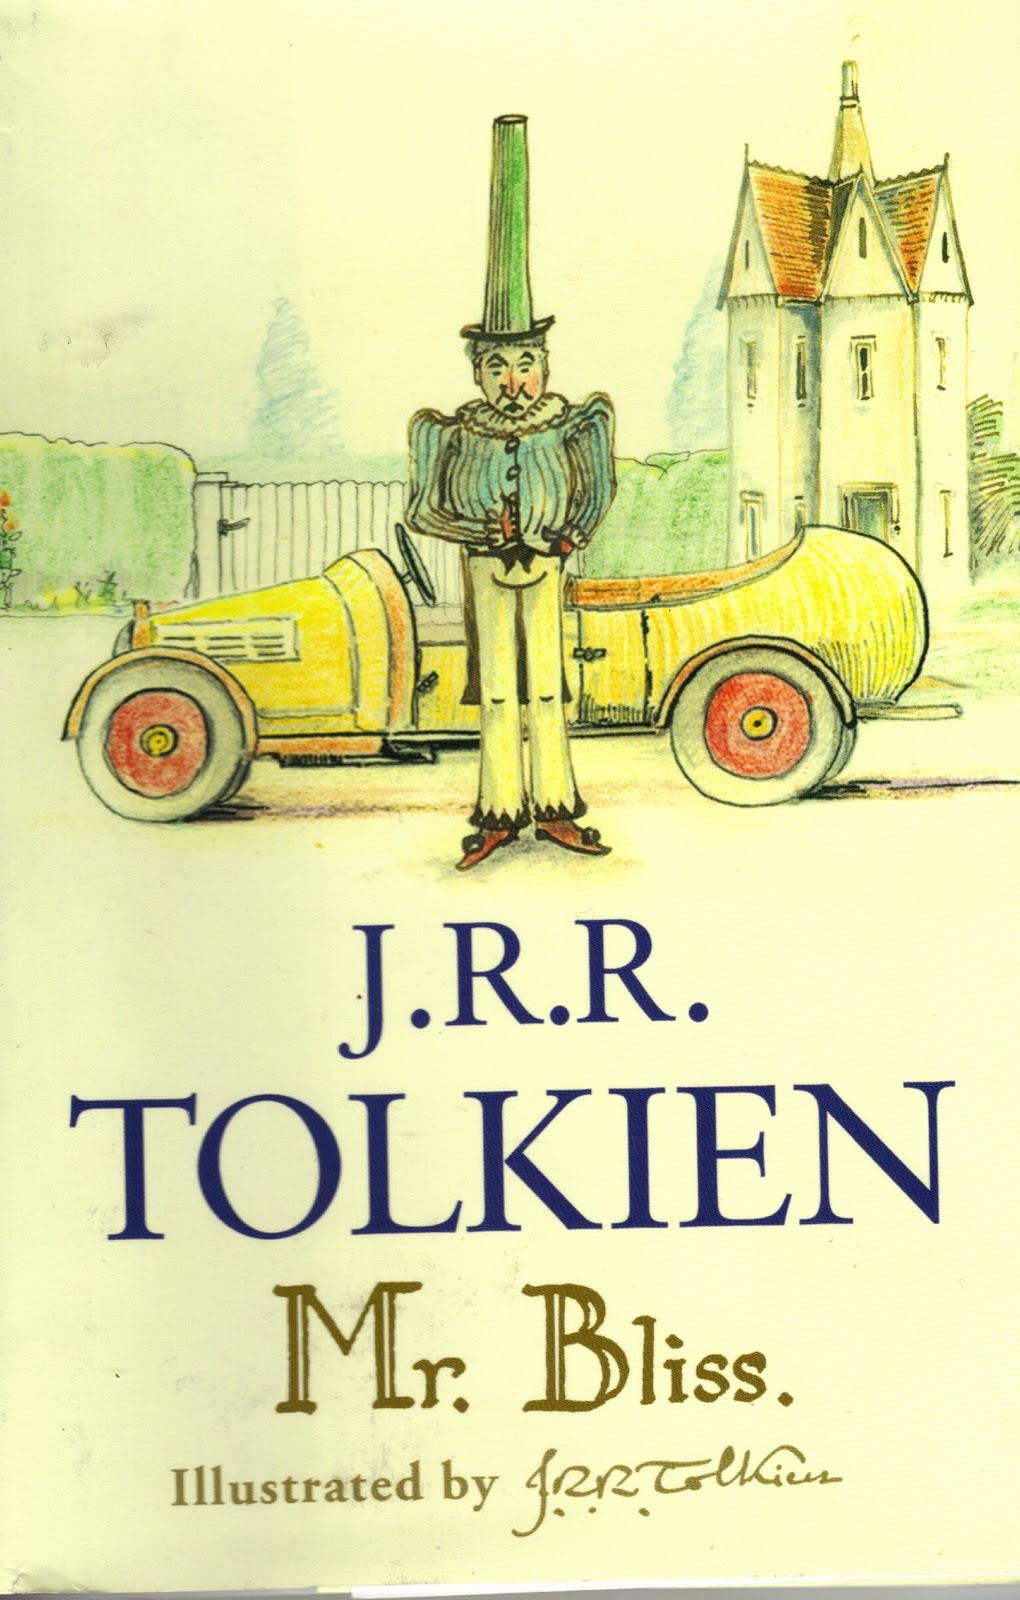 mr. bliss, de Tolkien - livros infantis obscuros